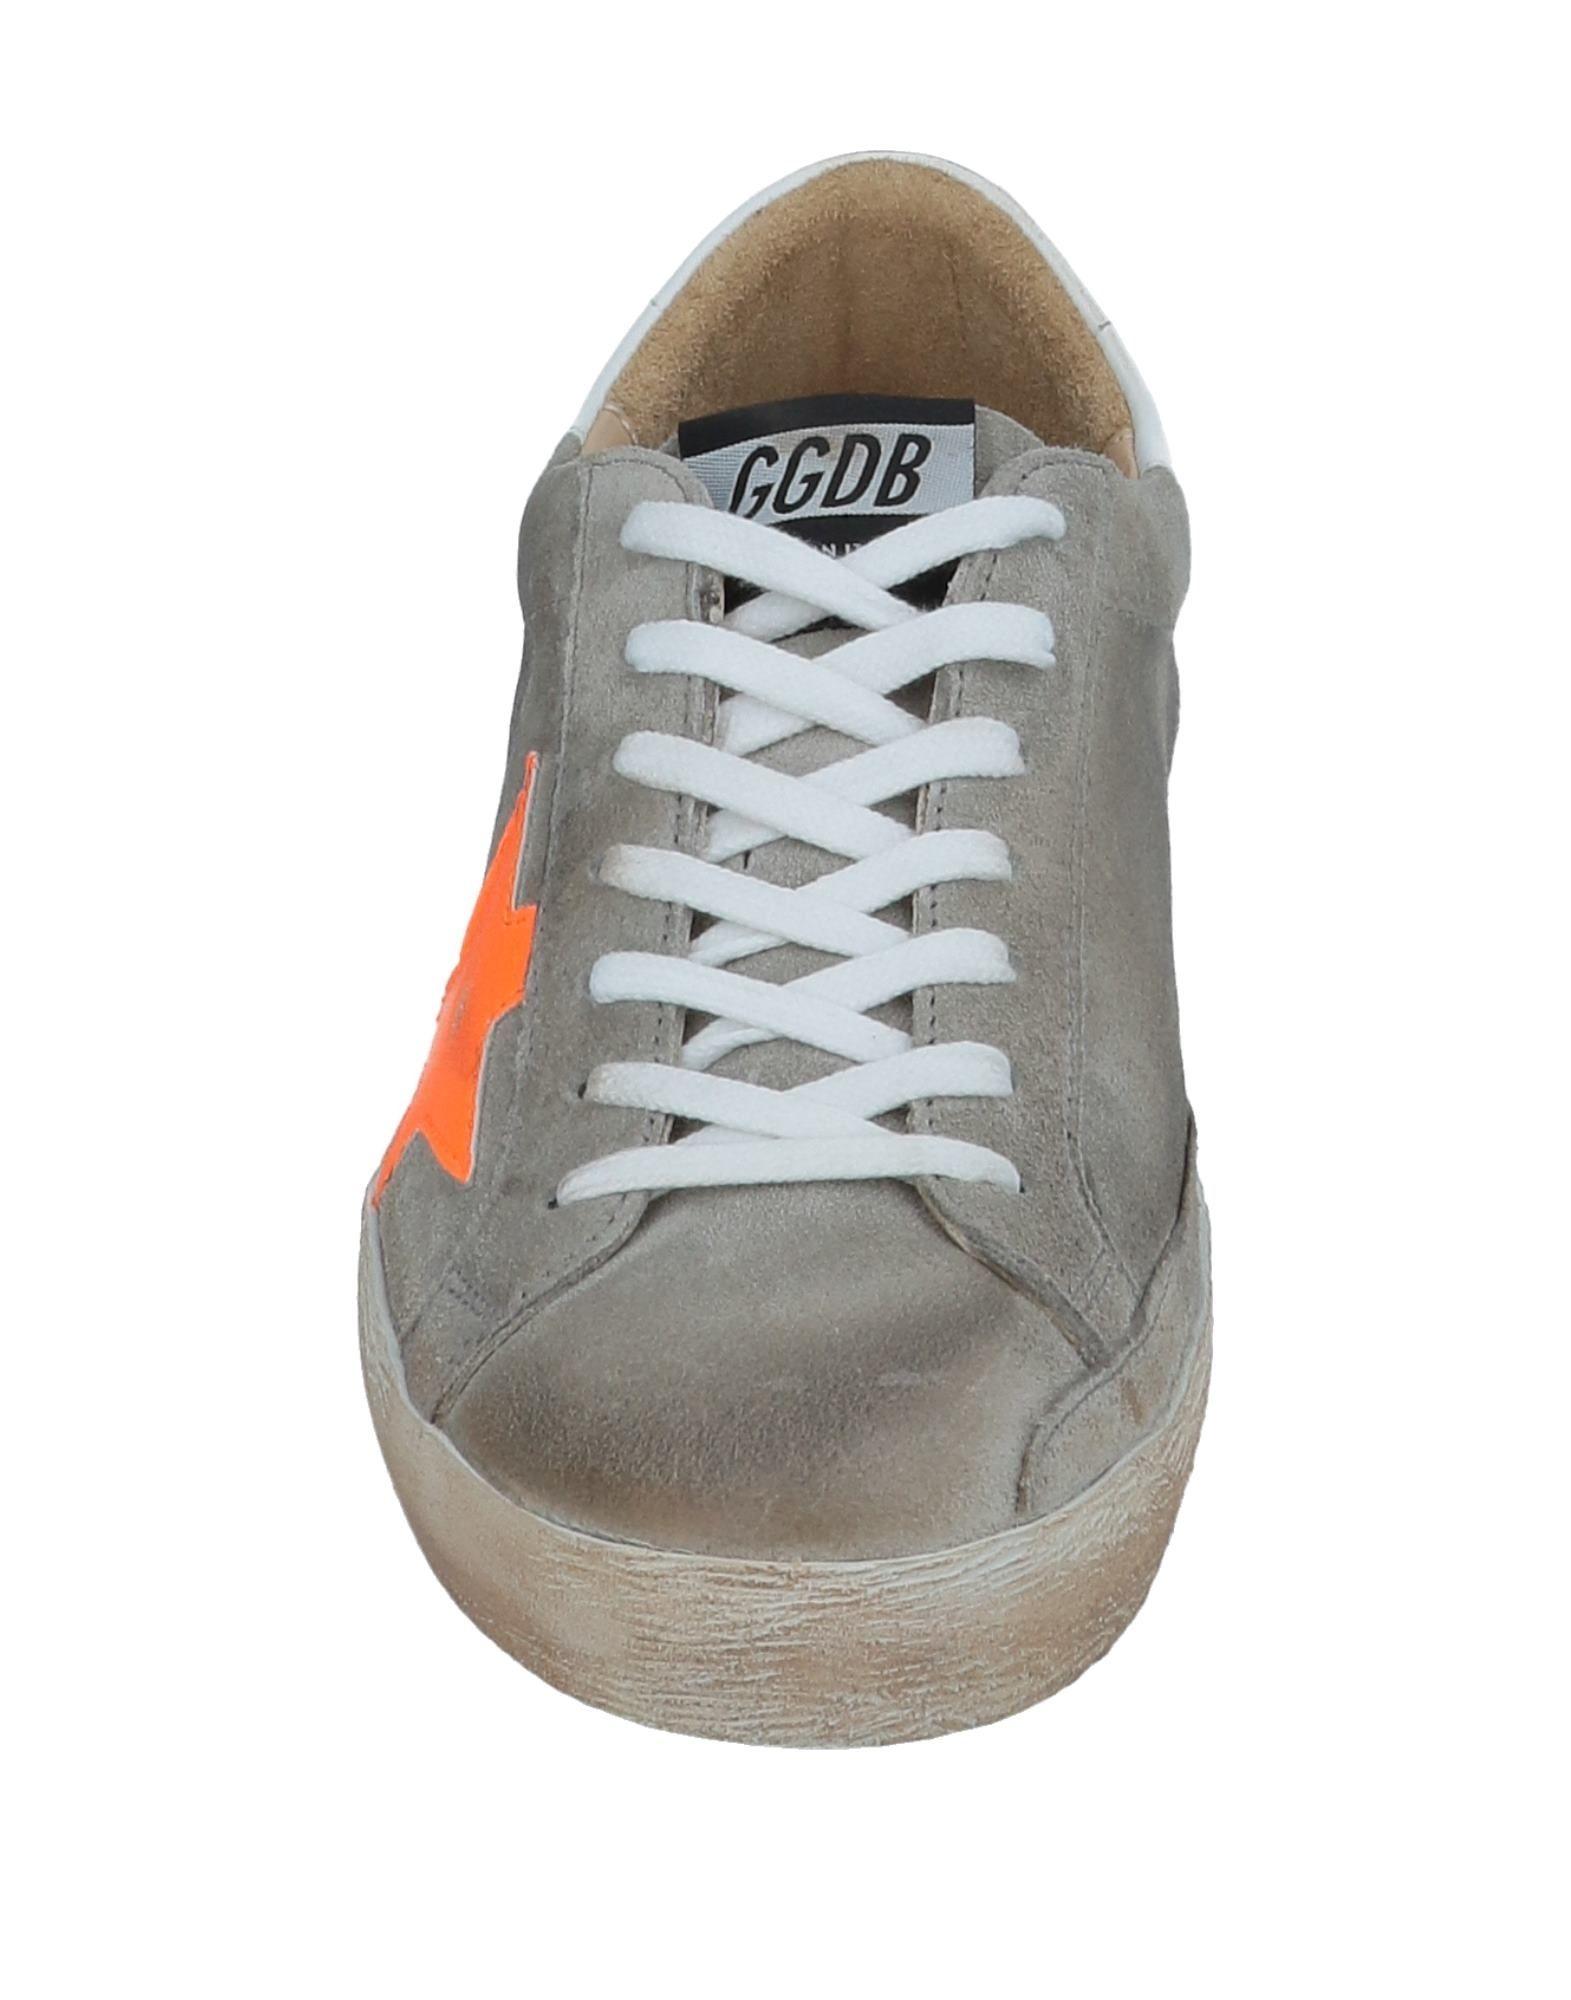 Golden Golden Golden Goose Deluxe Brand Sneakers Herren Gutes Preis-Leistungs-Verhältnis, es lohnt sich 2dd6af